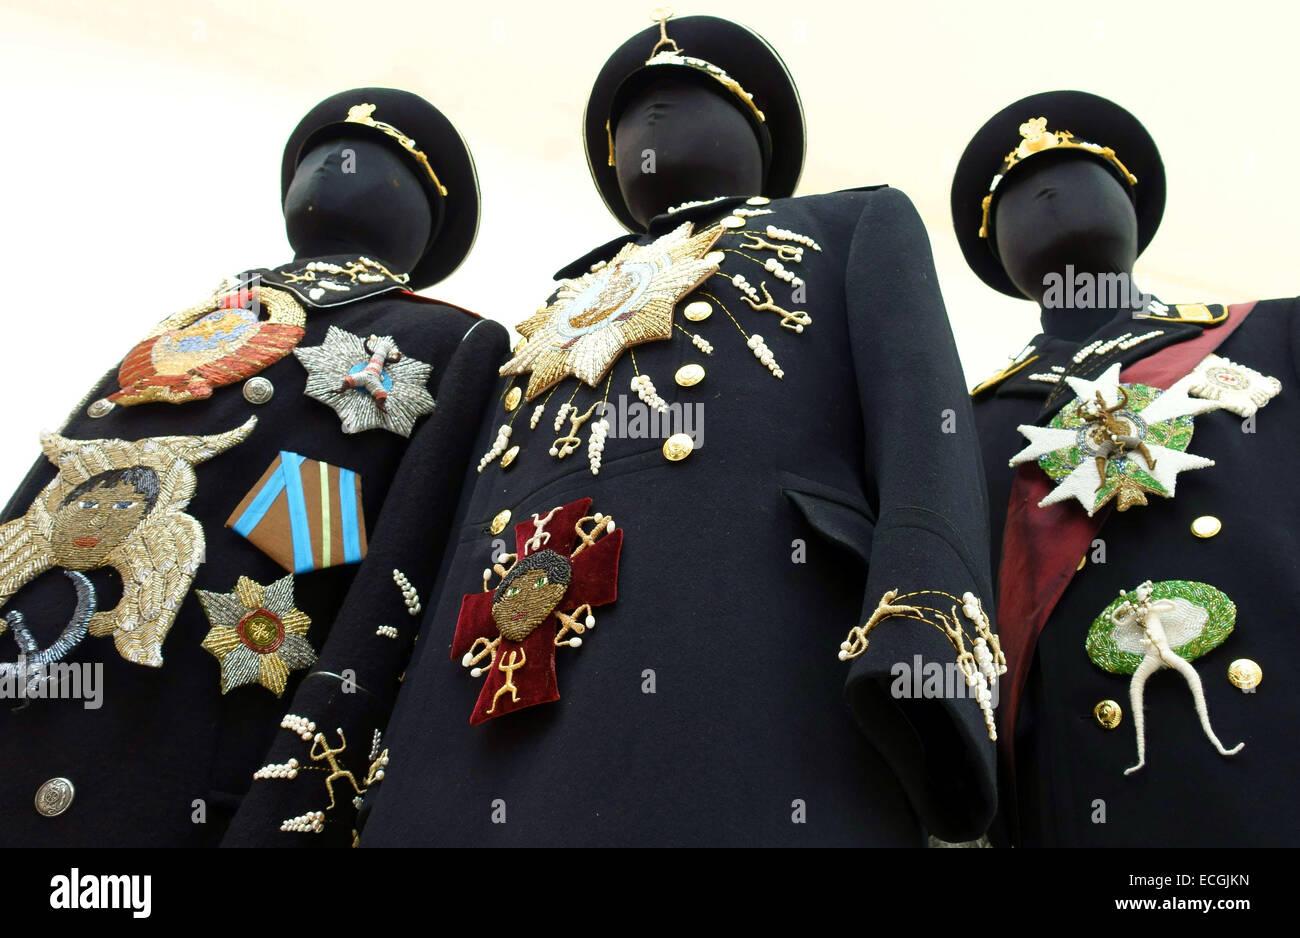 'Overcoat 2014' by Dmitri Tsvetkov (detail) in London art gallery - Stock Image